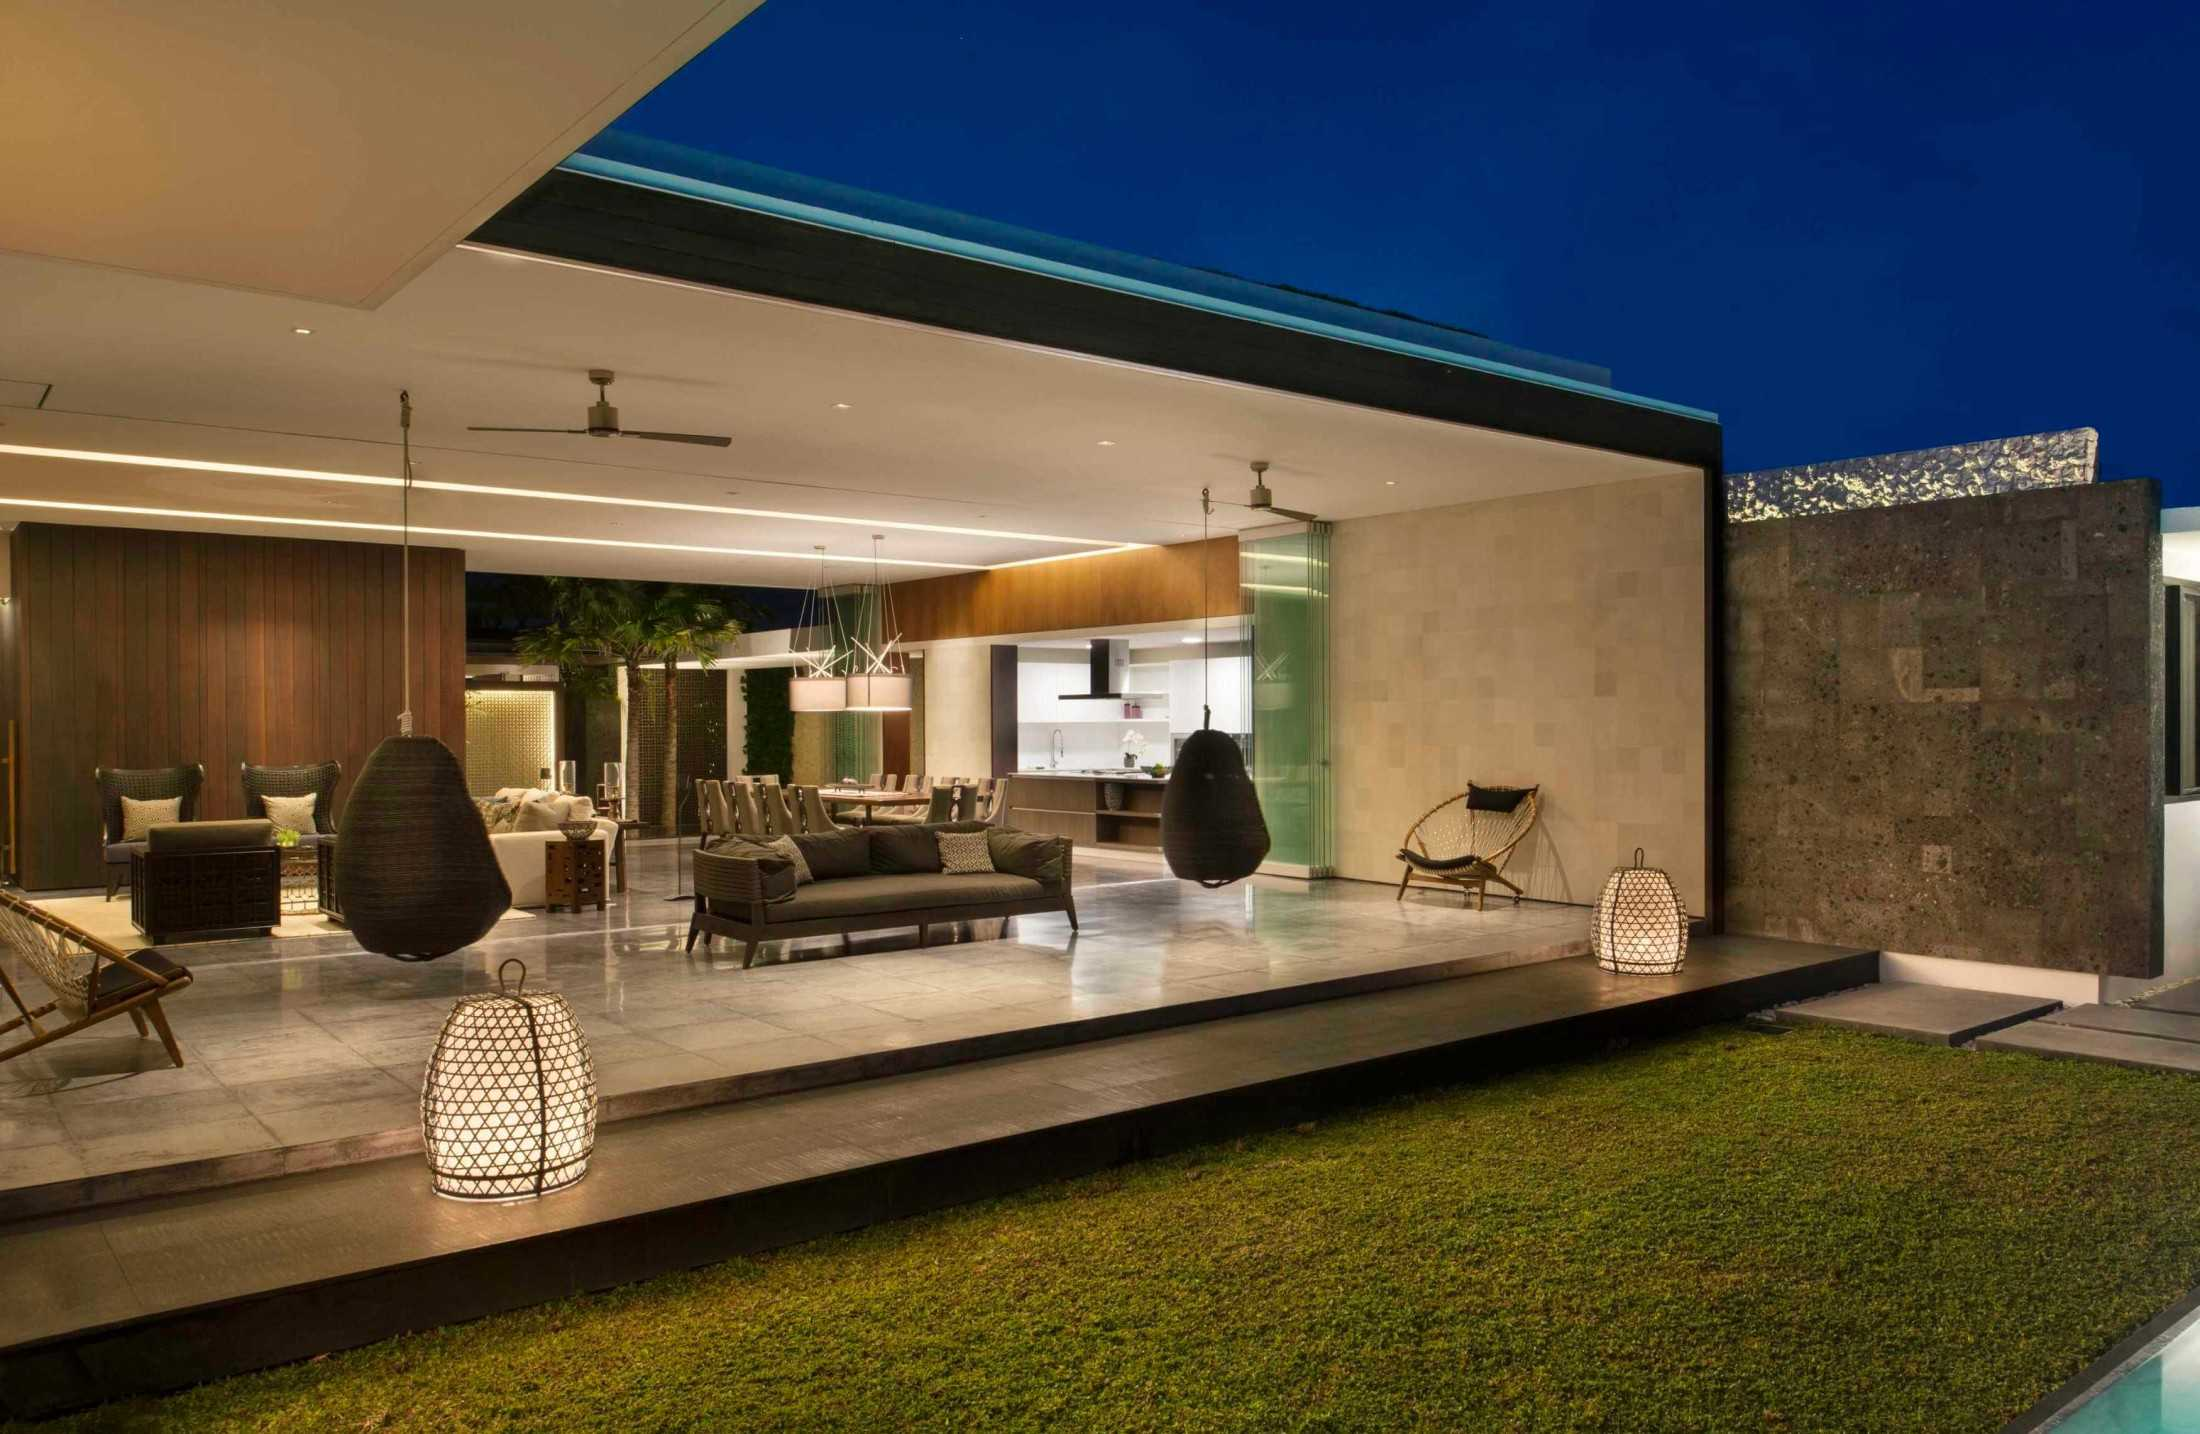 Arsitektur Villa Tropis Kontemporer Karya Parametr yang Menampilkan Surga Pulau Dewata | Foto artikel Arsitag